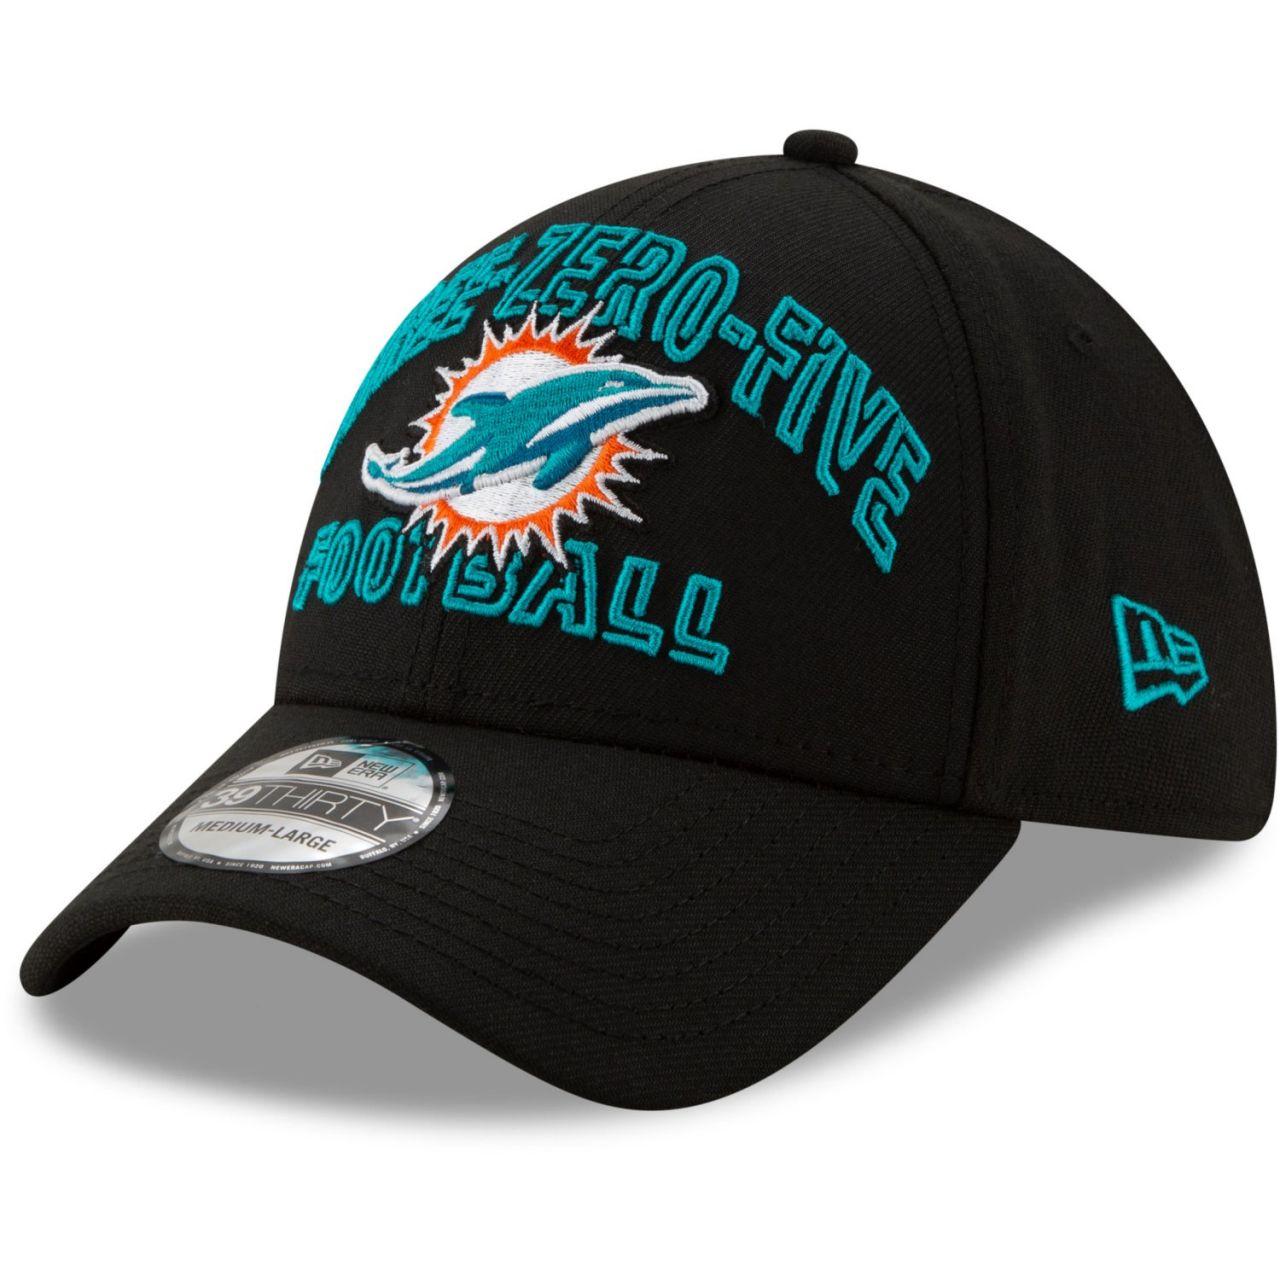 amfoo - New Era 39Thirty Cap - NFL 2020 DRAFT Miami Dolphins